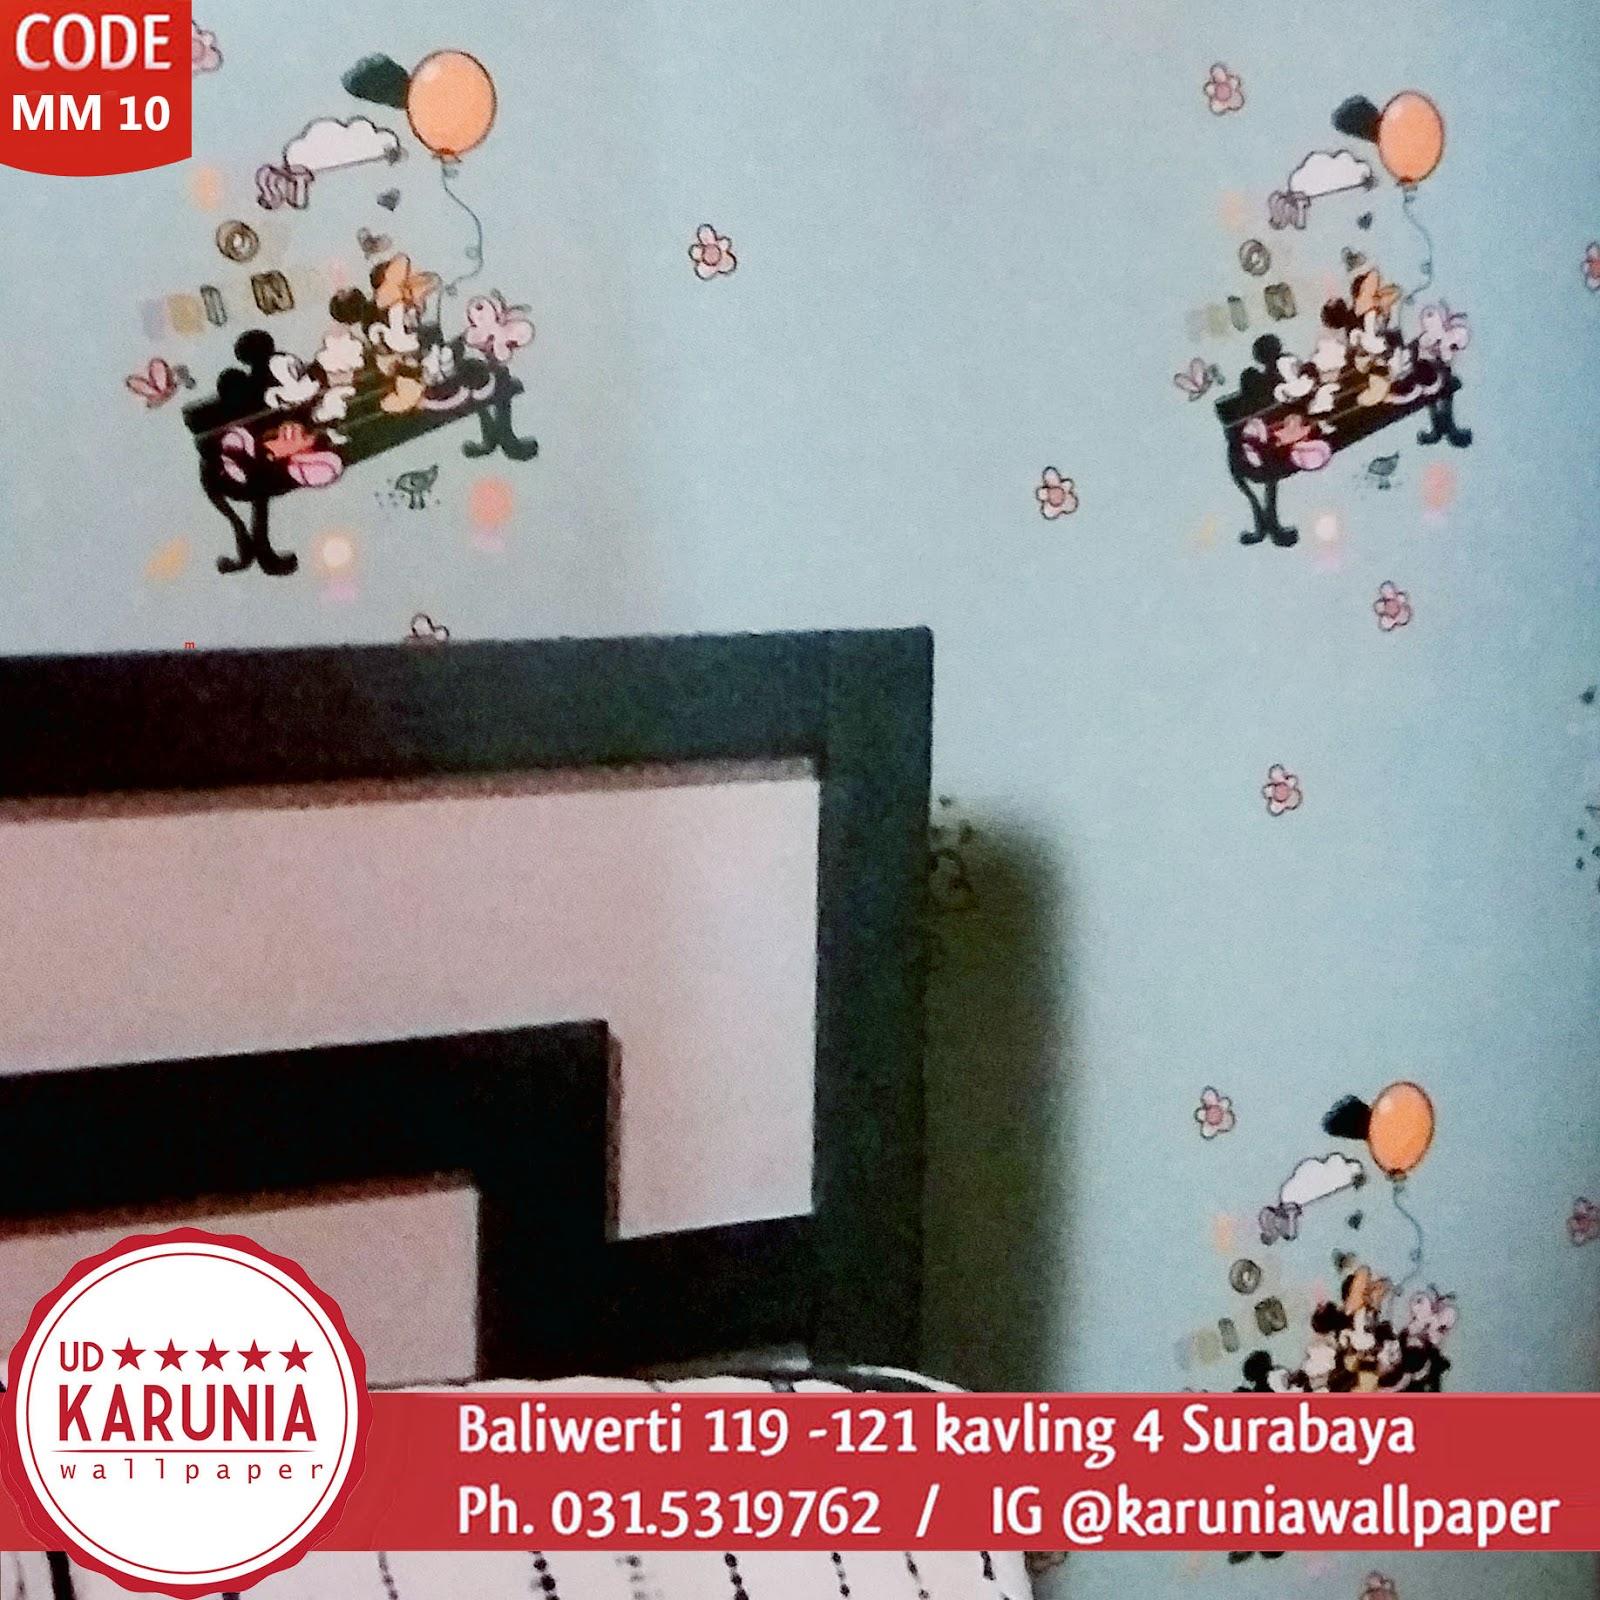 jual wallpaper anak disney mickey mouse toko karuniawallpaper surabaya